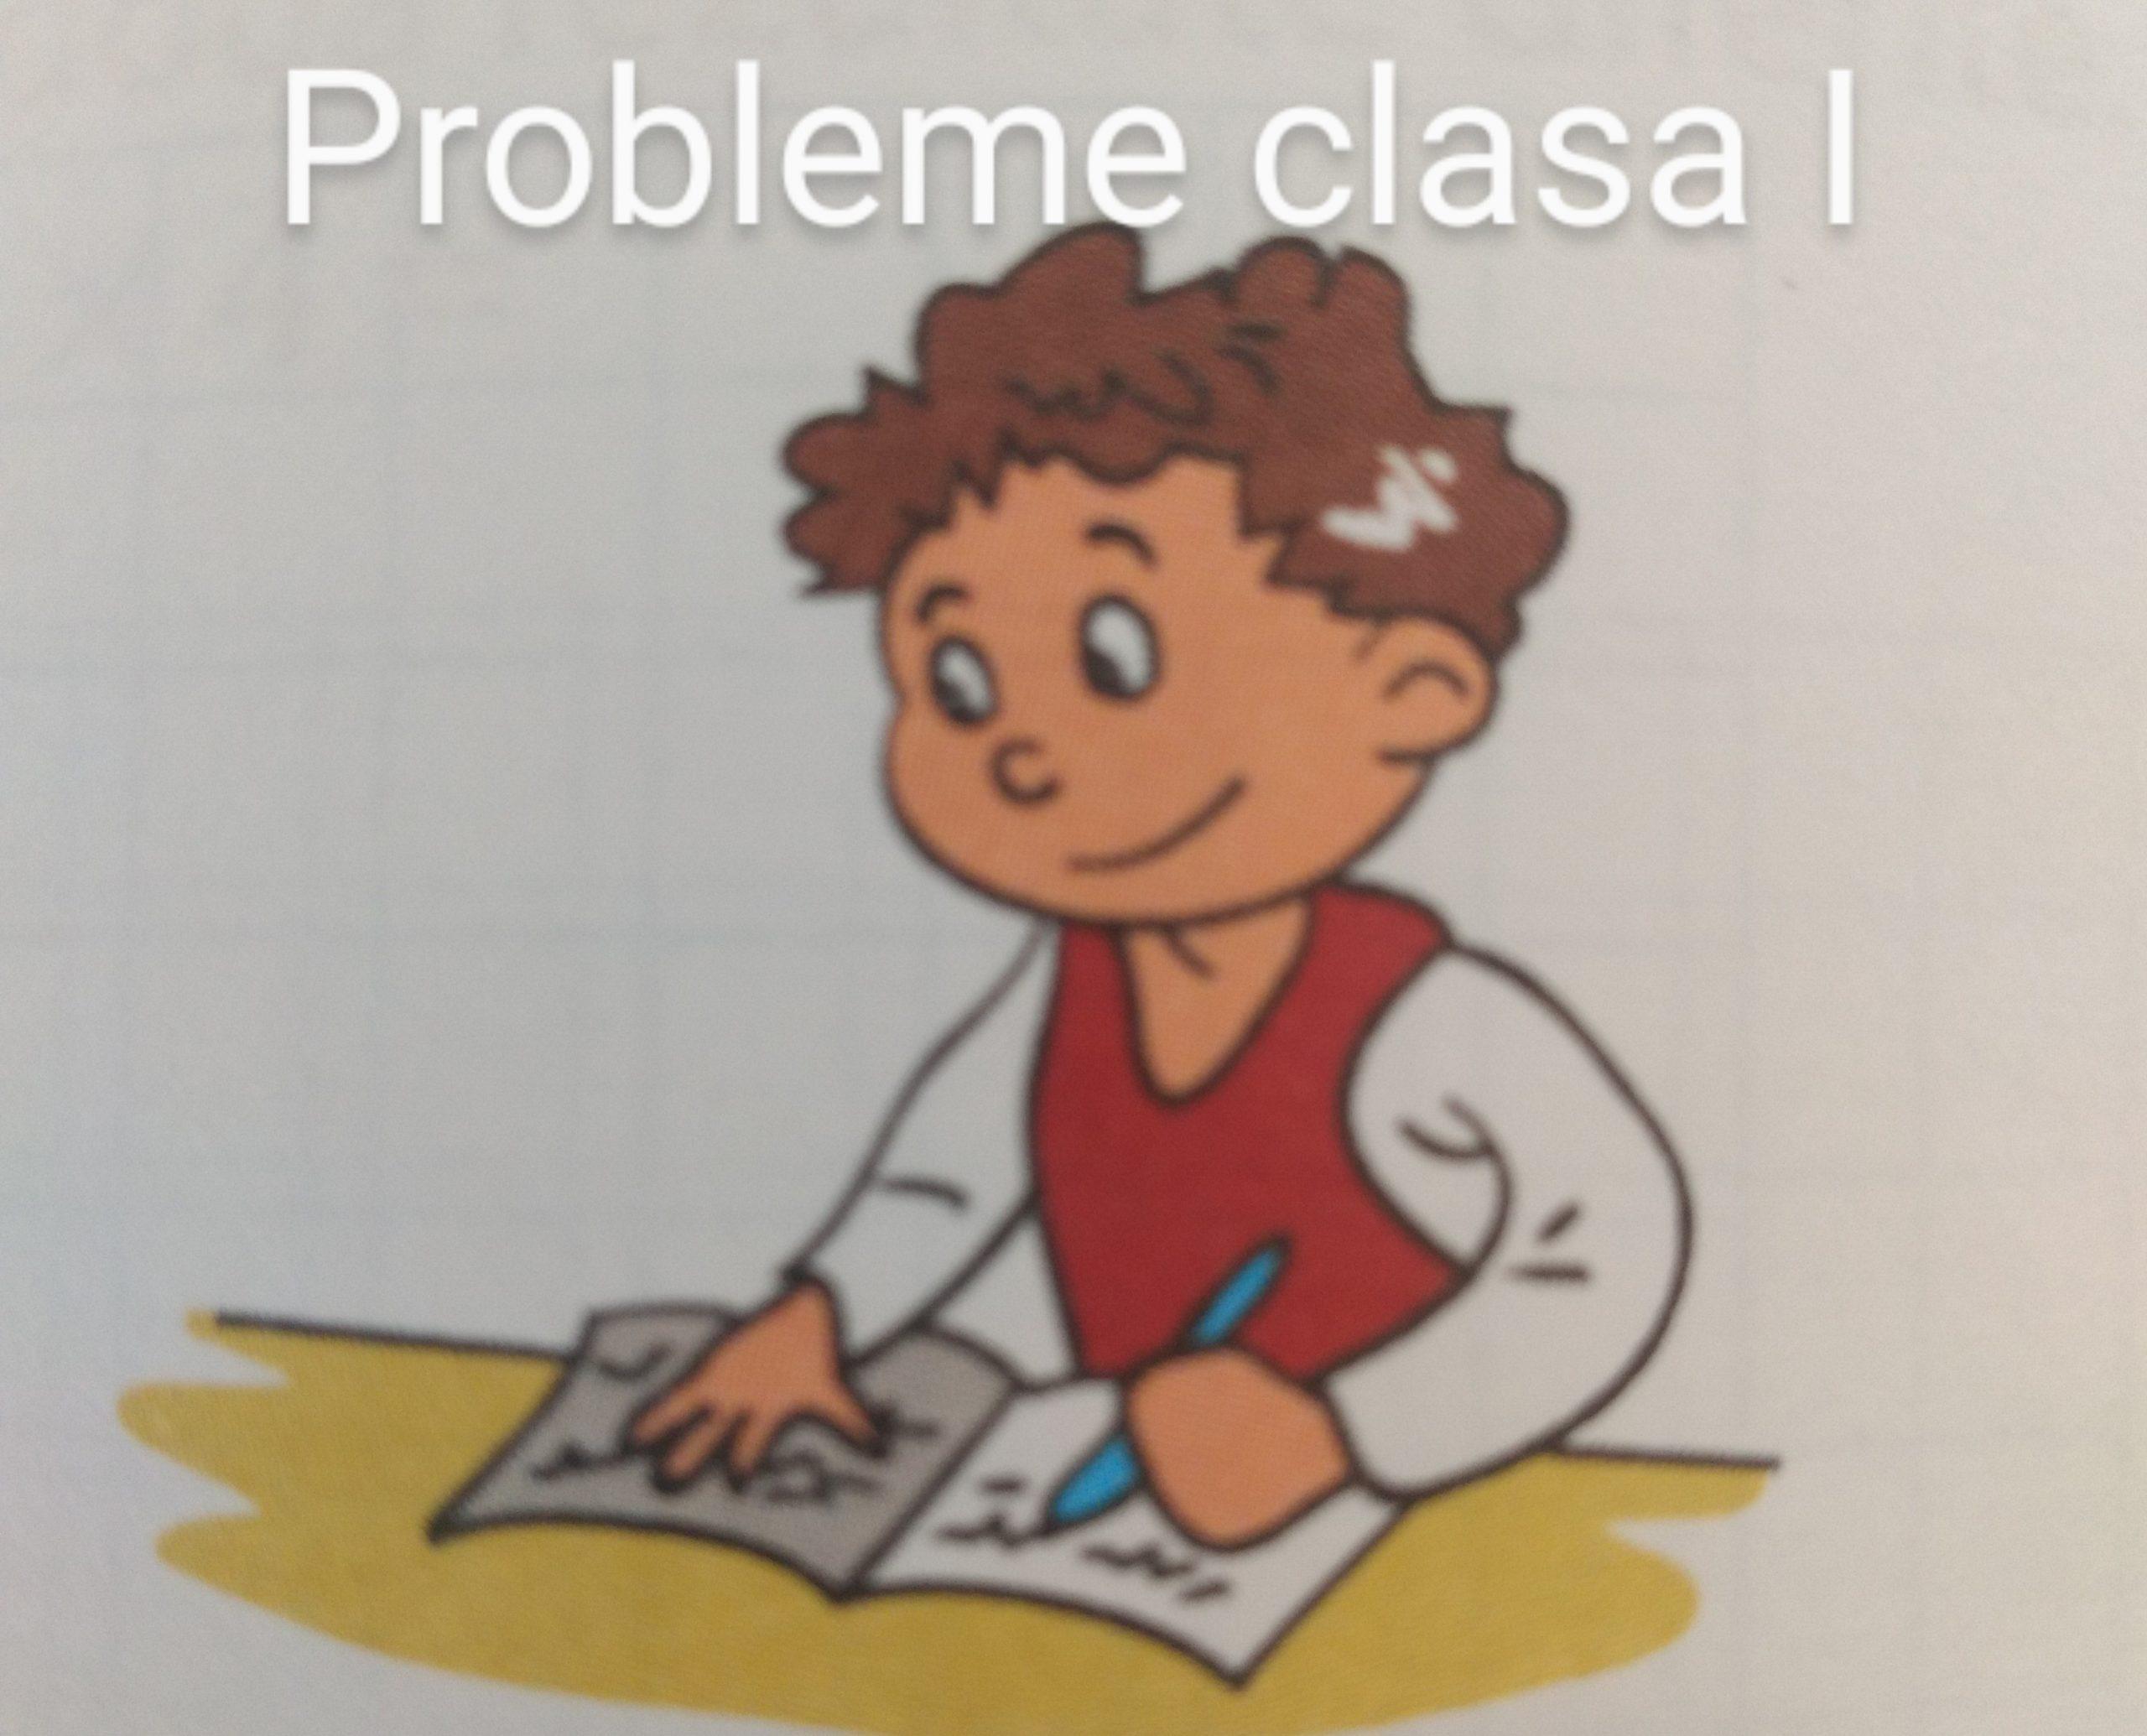 Probleme clasa I